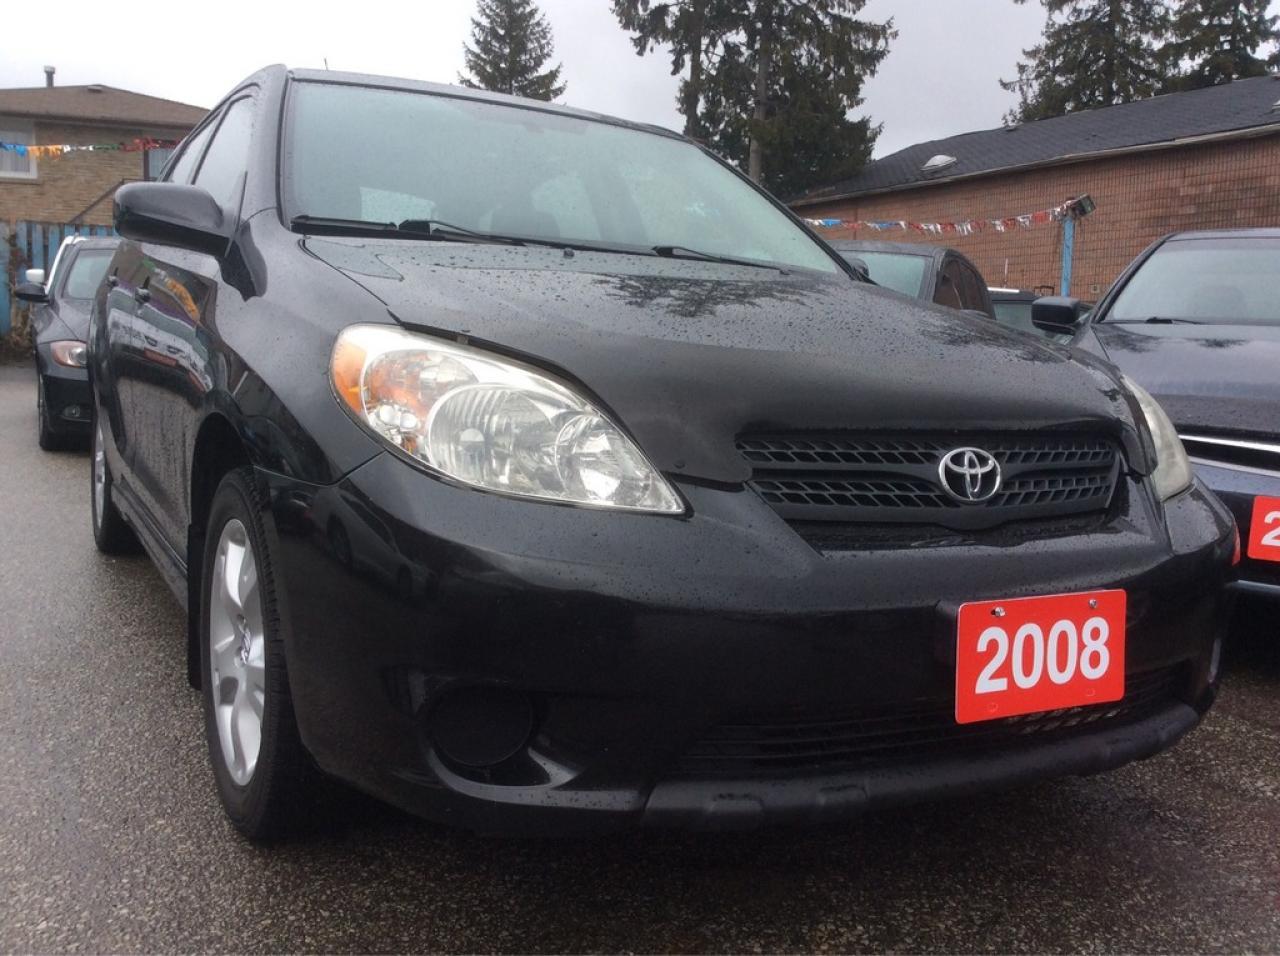 2008 Toyota Matrix XR EXCELLENT SHAPE Alloys w/All Power Options